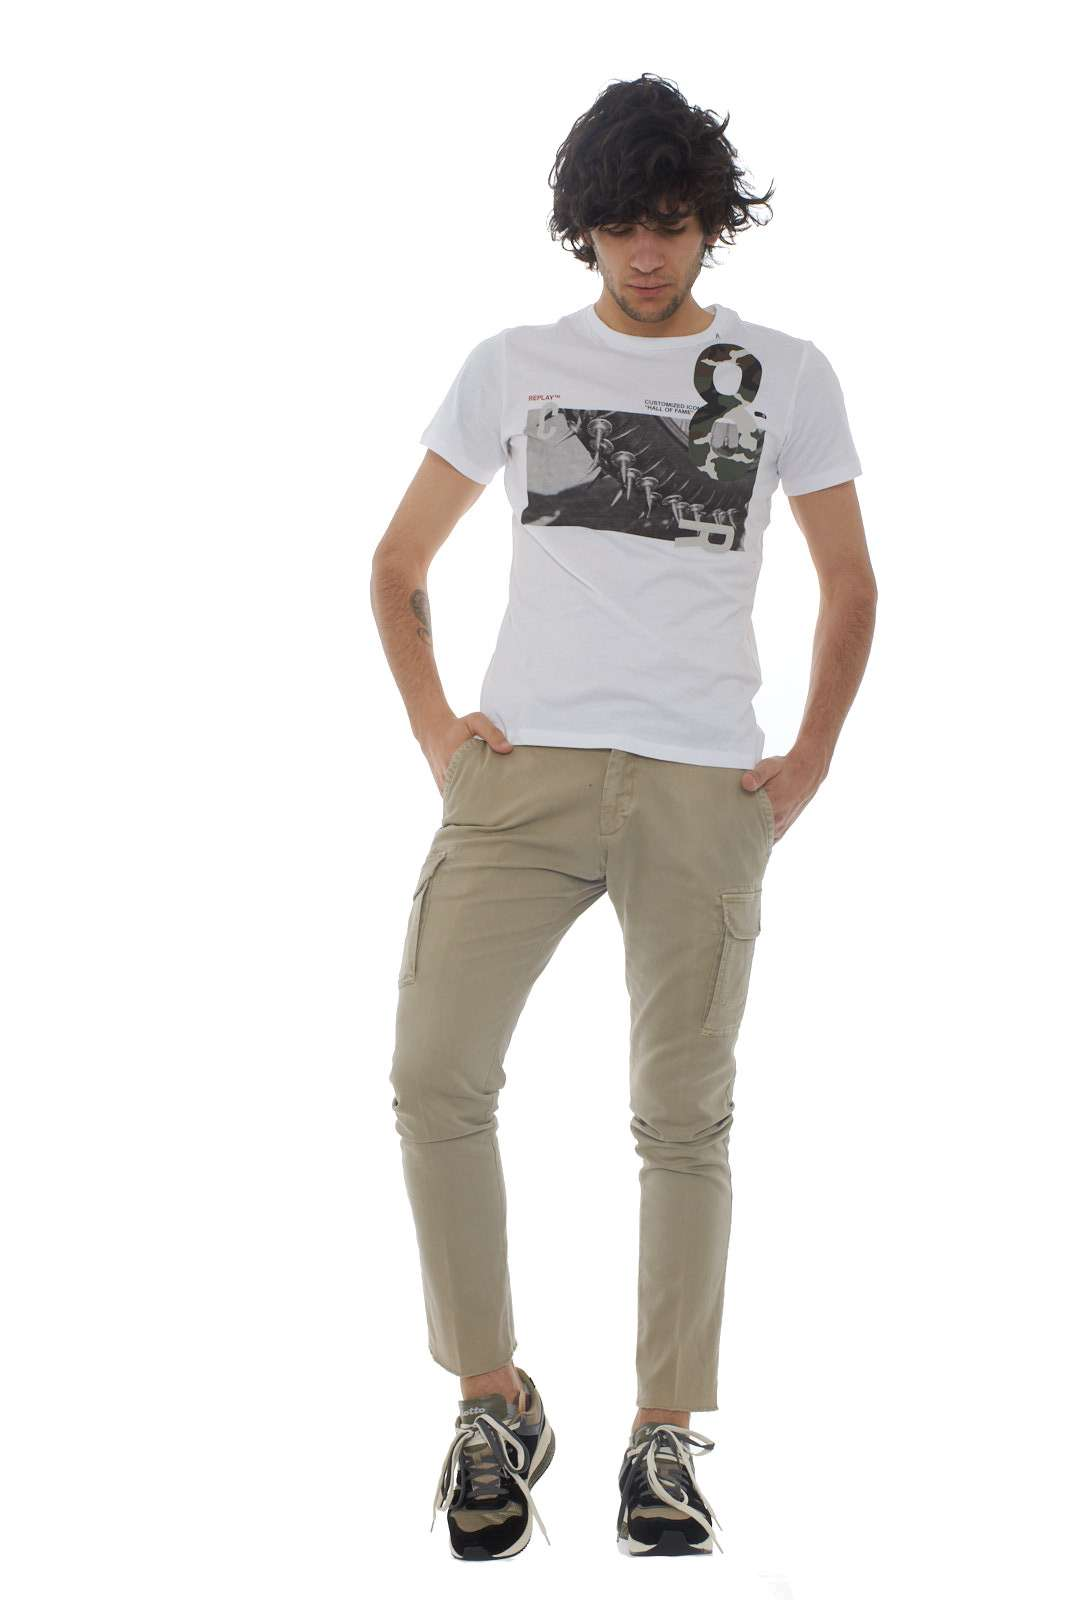 https://www.parmax.com/media/catalog/product/a/i/PE-outlet_parmax-t-shirt-uomo-Replay-M3733-D.jpg